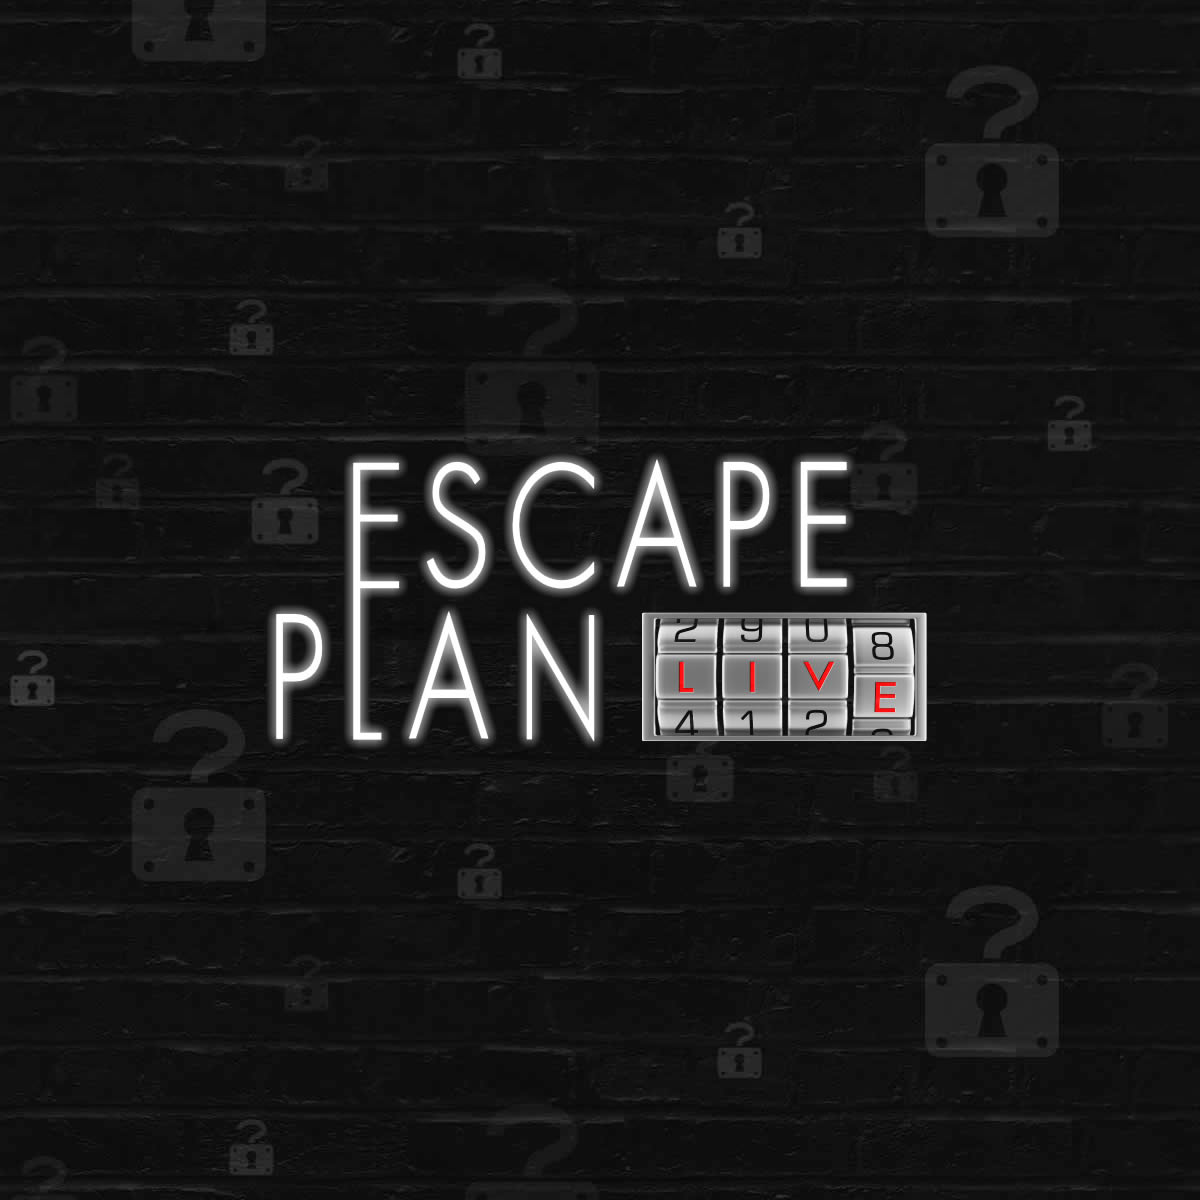 Escape Room Live Chatham